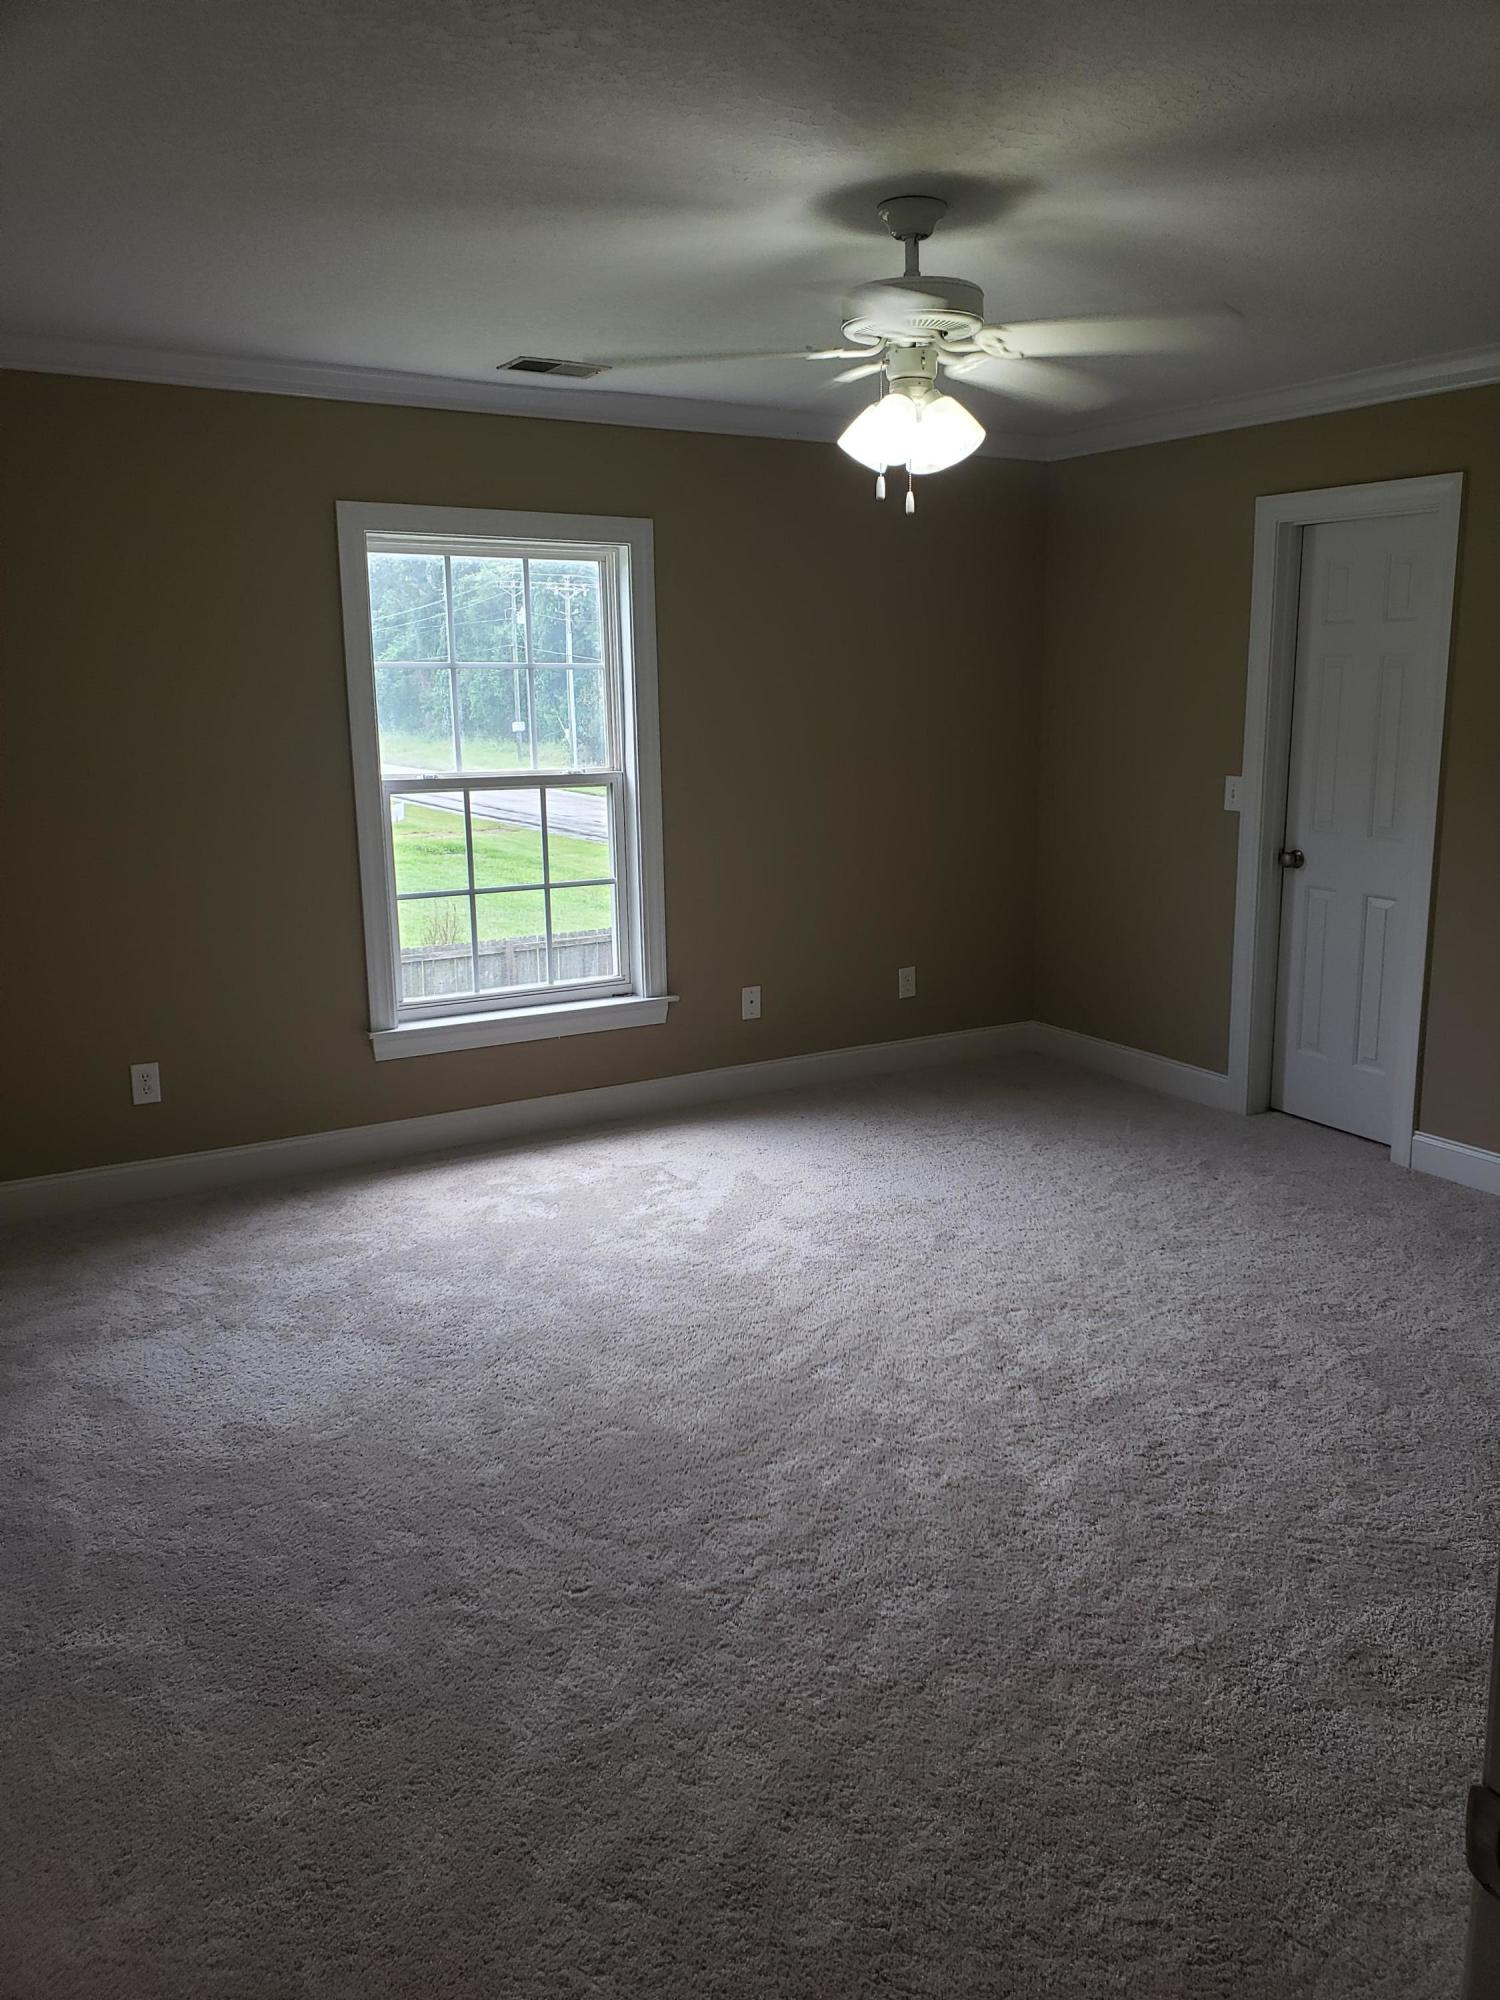 Montague Pointe Homes For Sale - 100 Gavins, Goose Creek, SC - 5